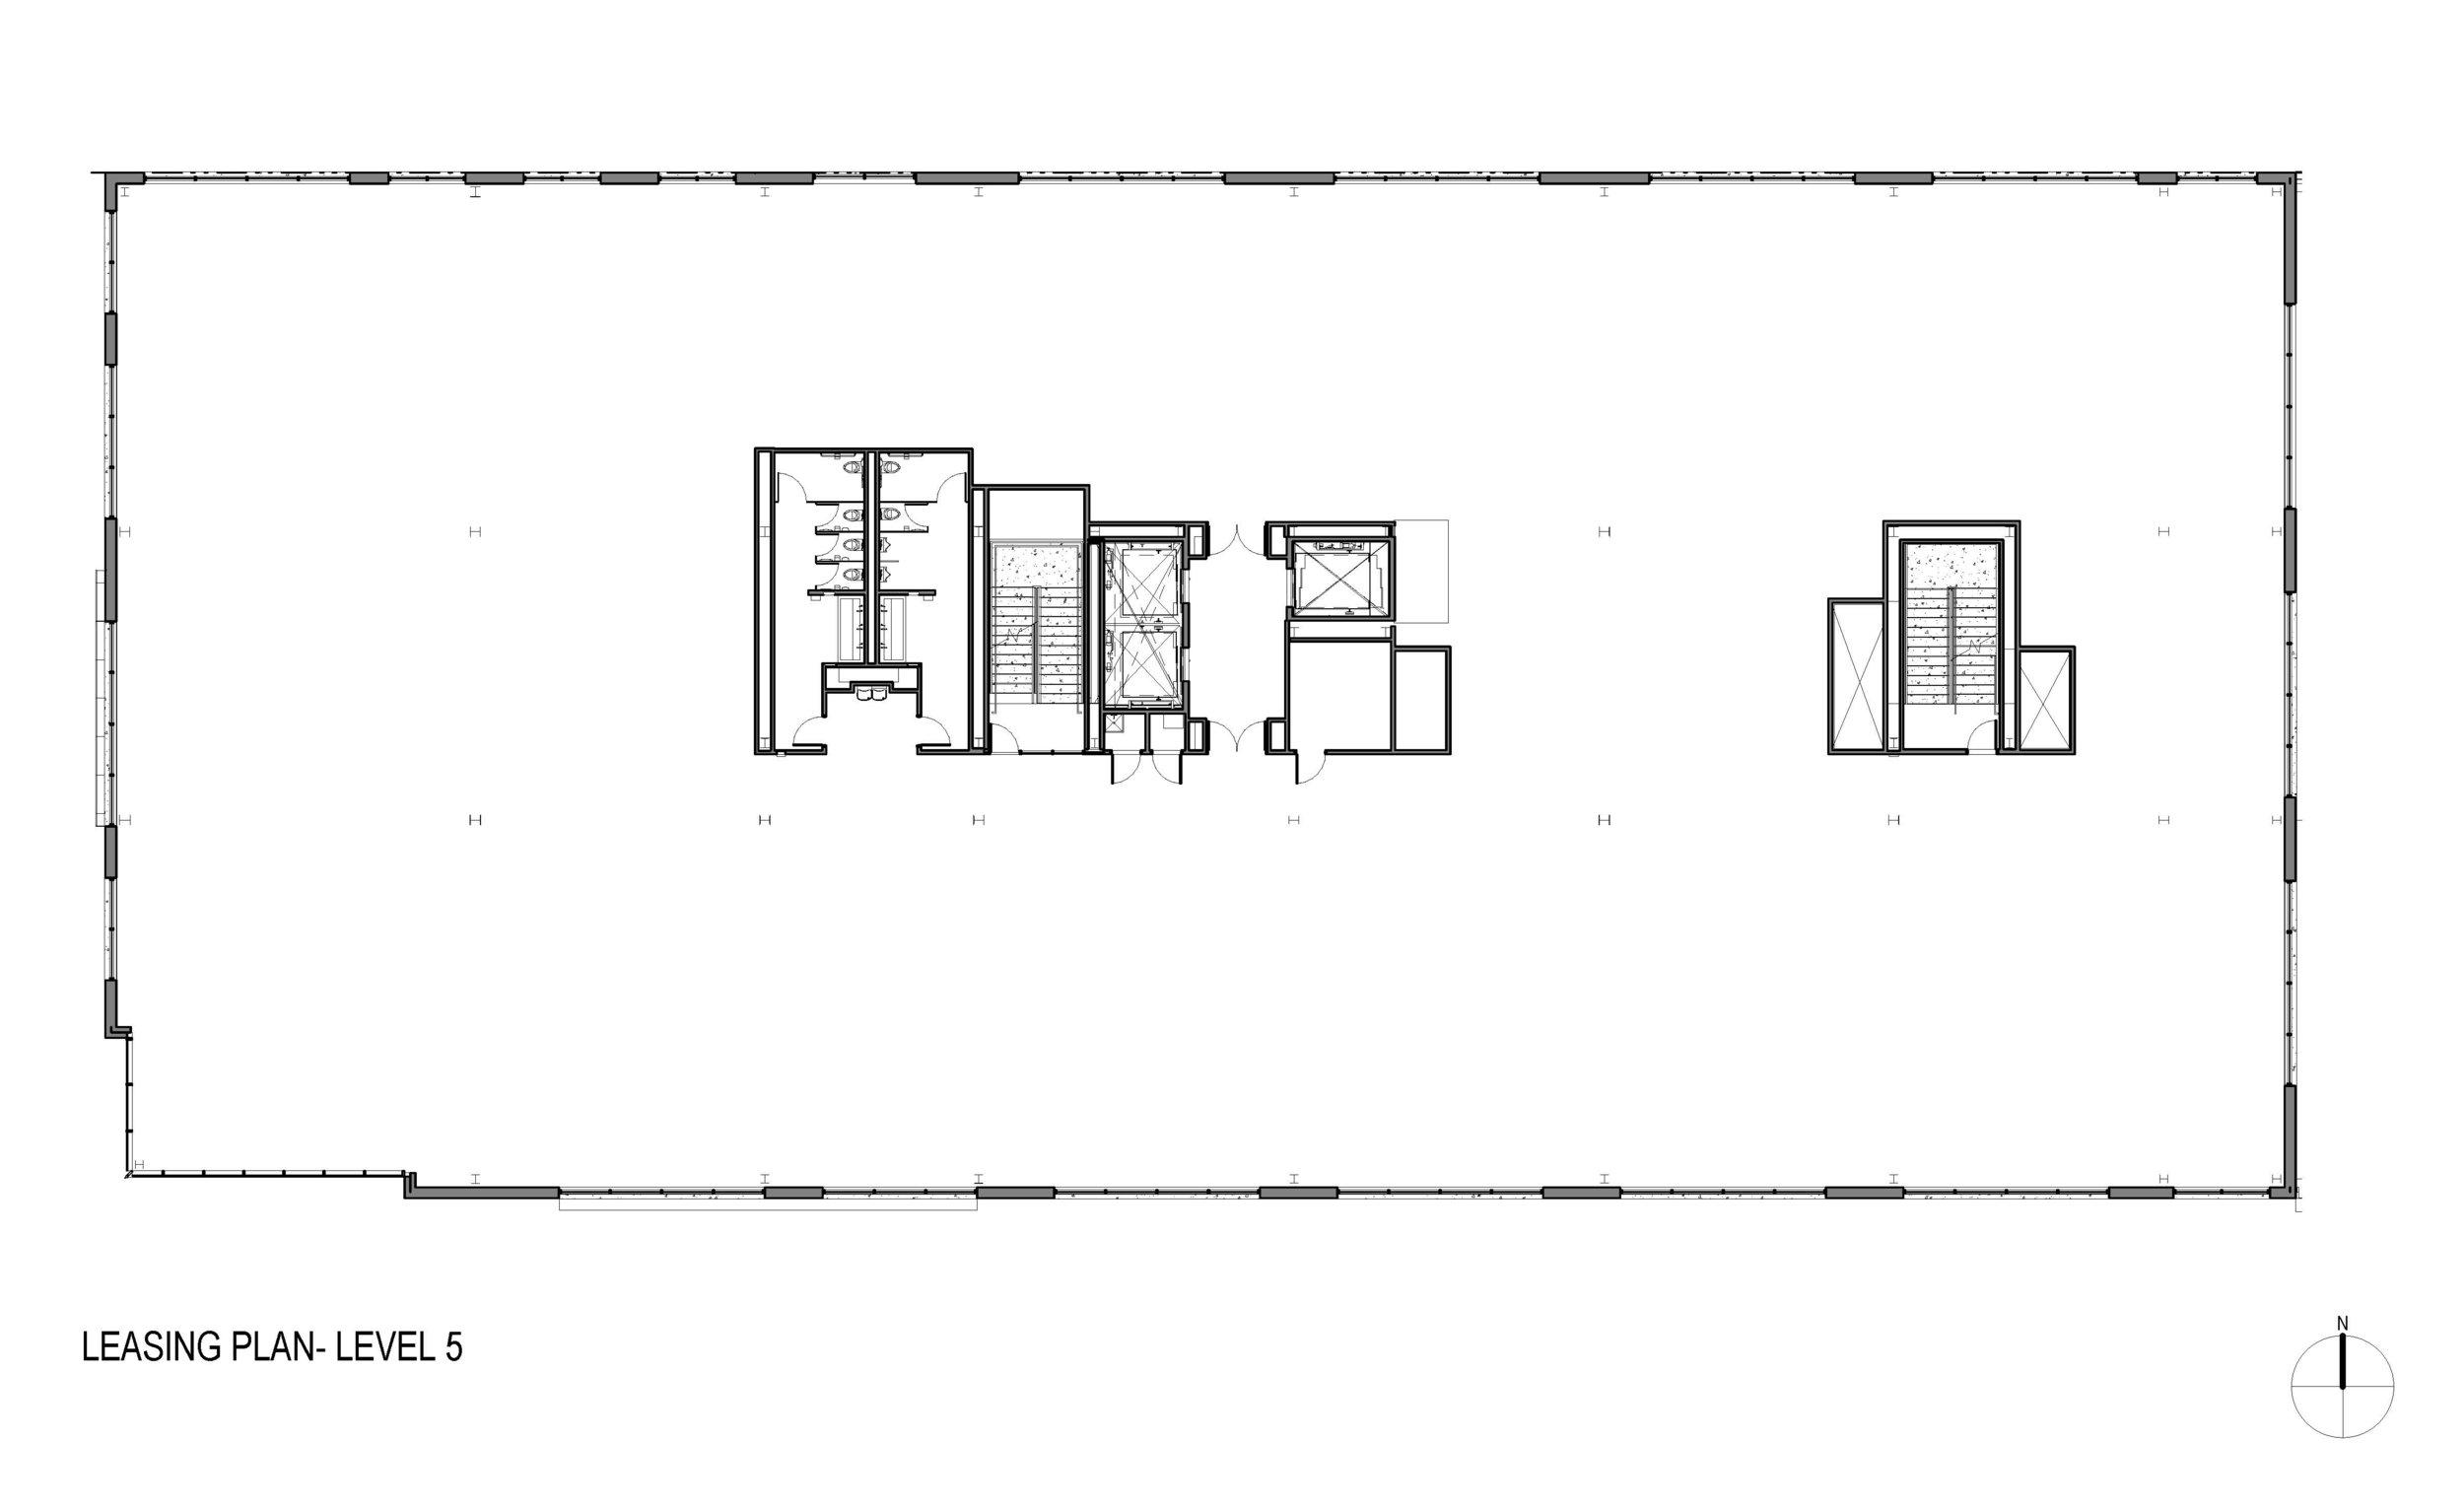 Catalyst-5th Floor Leasing Study 3.31.17.jpg